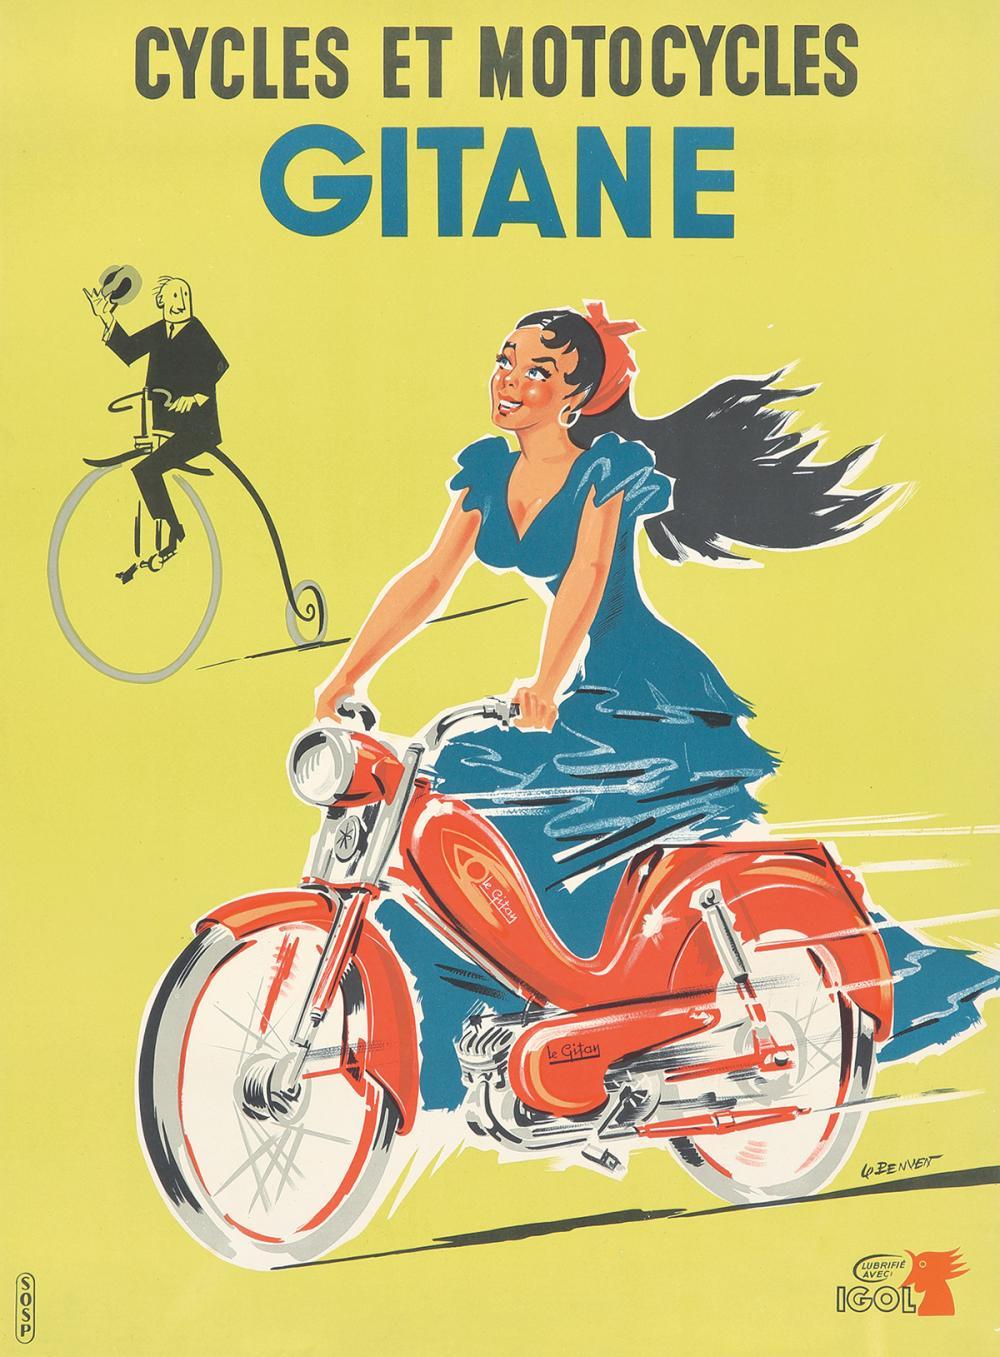 Gitane. ca. 1950s.